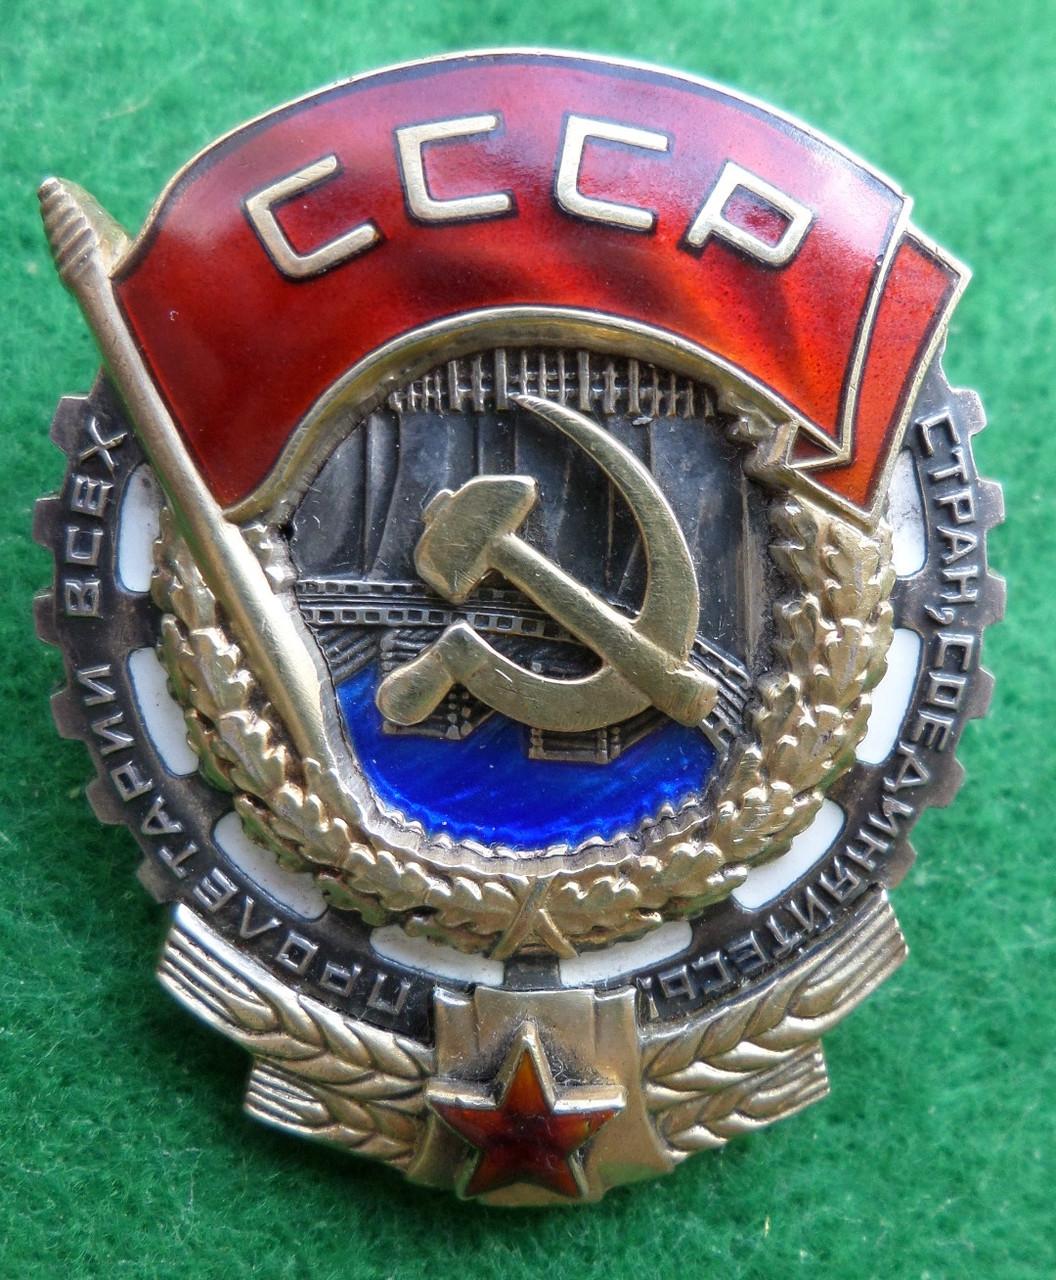 Орден Трудового Красного Знамени МОНДВОР  №7.236 серебро переделан с оригинала подвесного